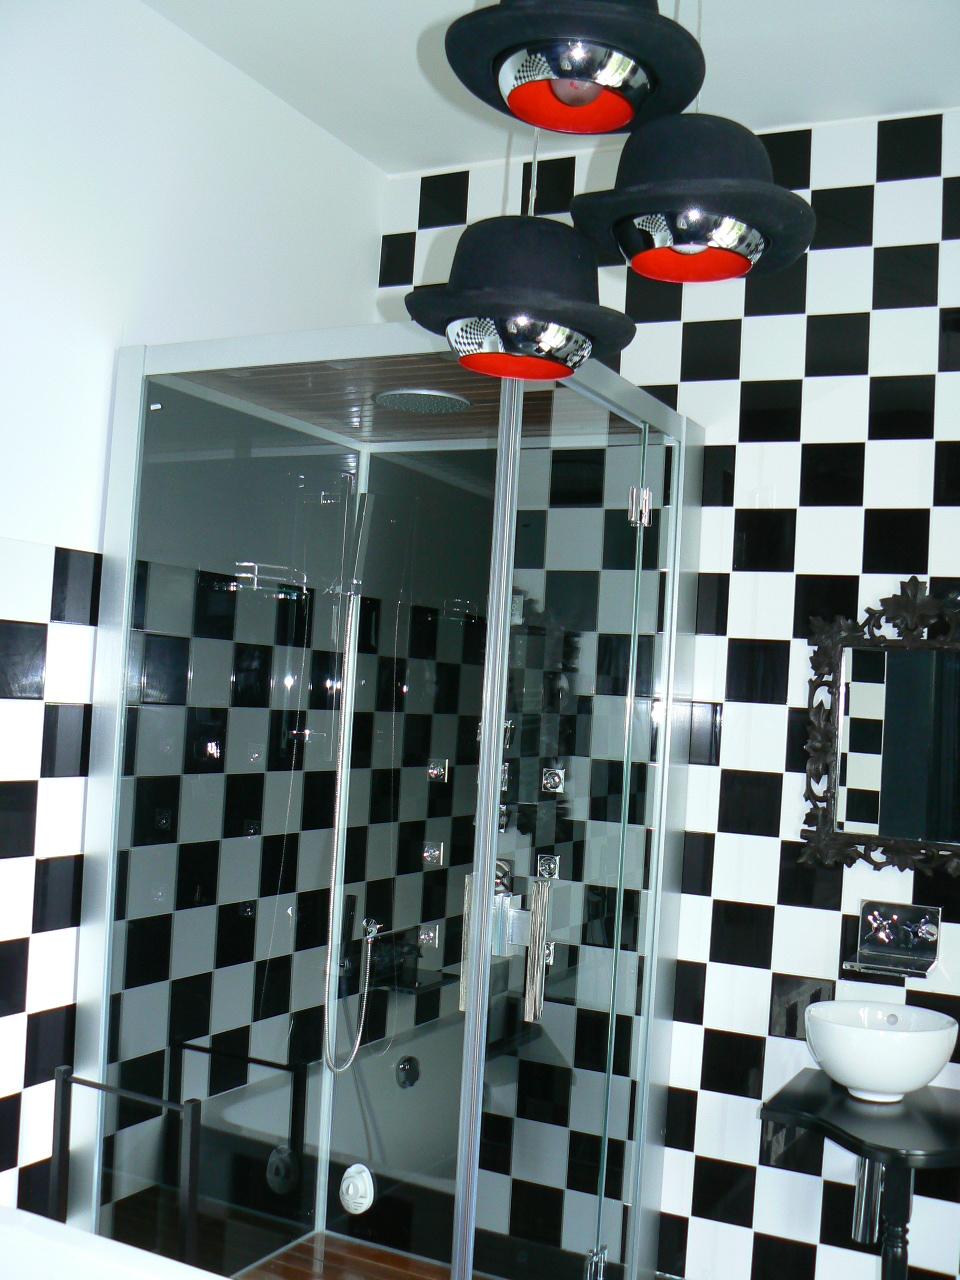 Miroir Salle De Bain Monsieur Bricolage ~ Air B Nb Contenusetstrategies Com